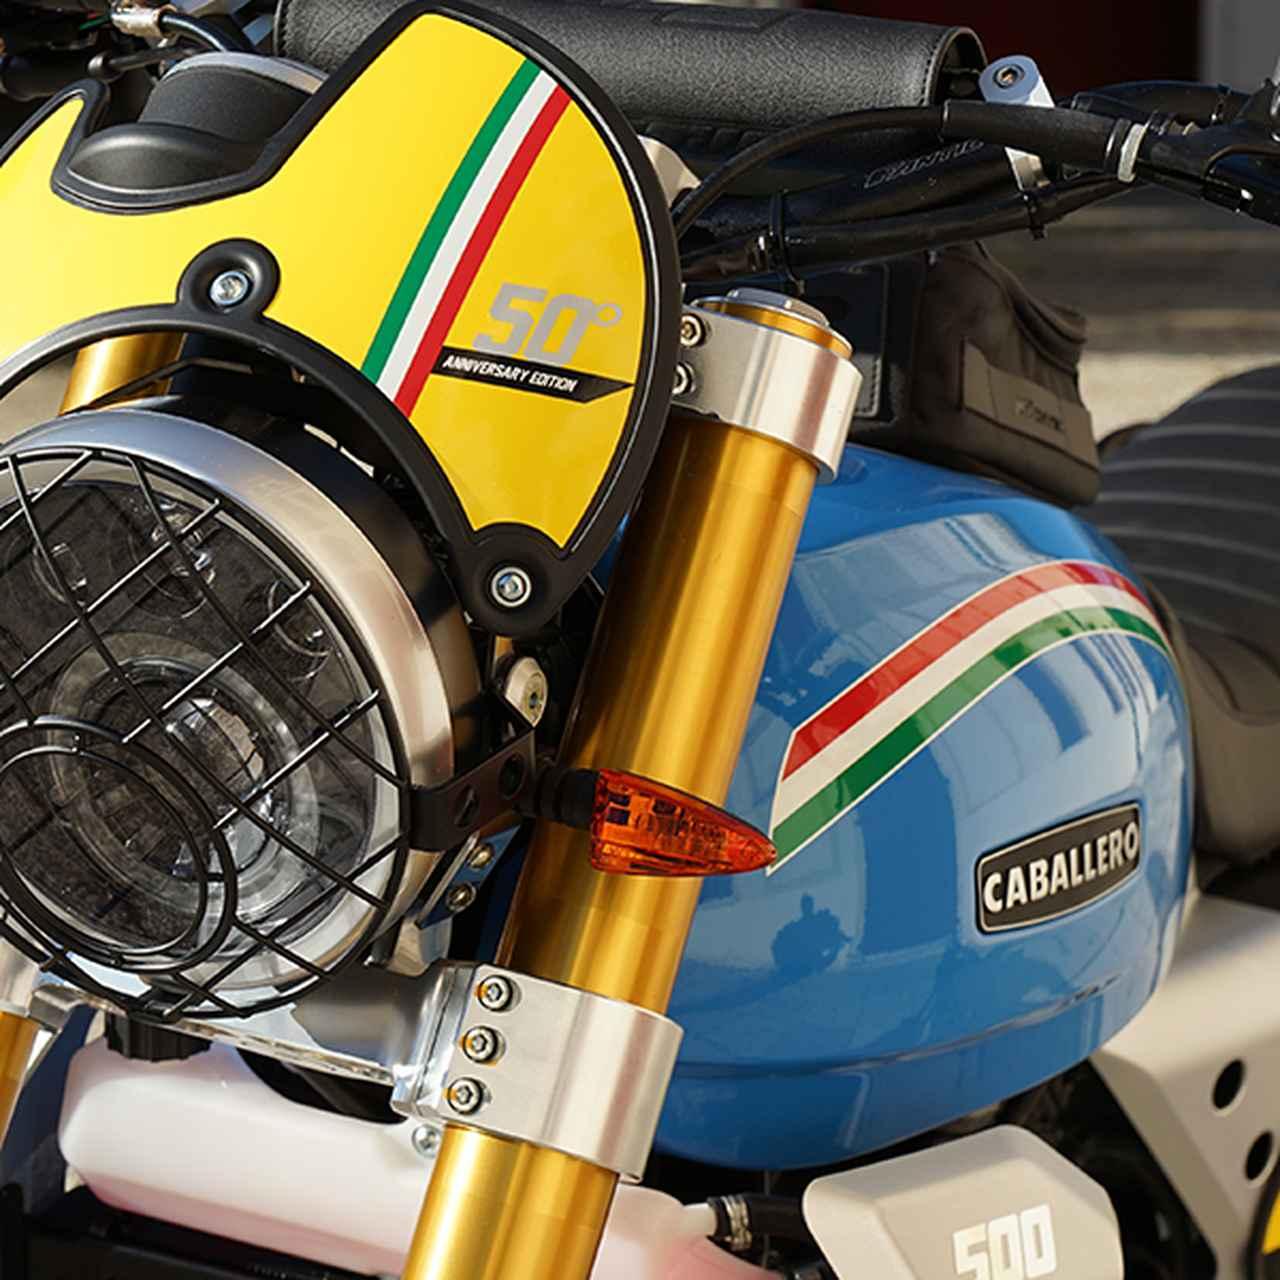 Images : 4番目の画像 - FANTIC「CABALLERO SCRAMBLER 500 ANNIVERSARY」の写真をもっと見る - webオートバイ